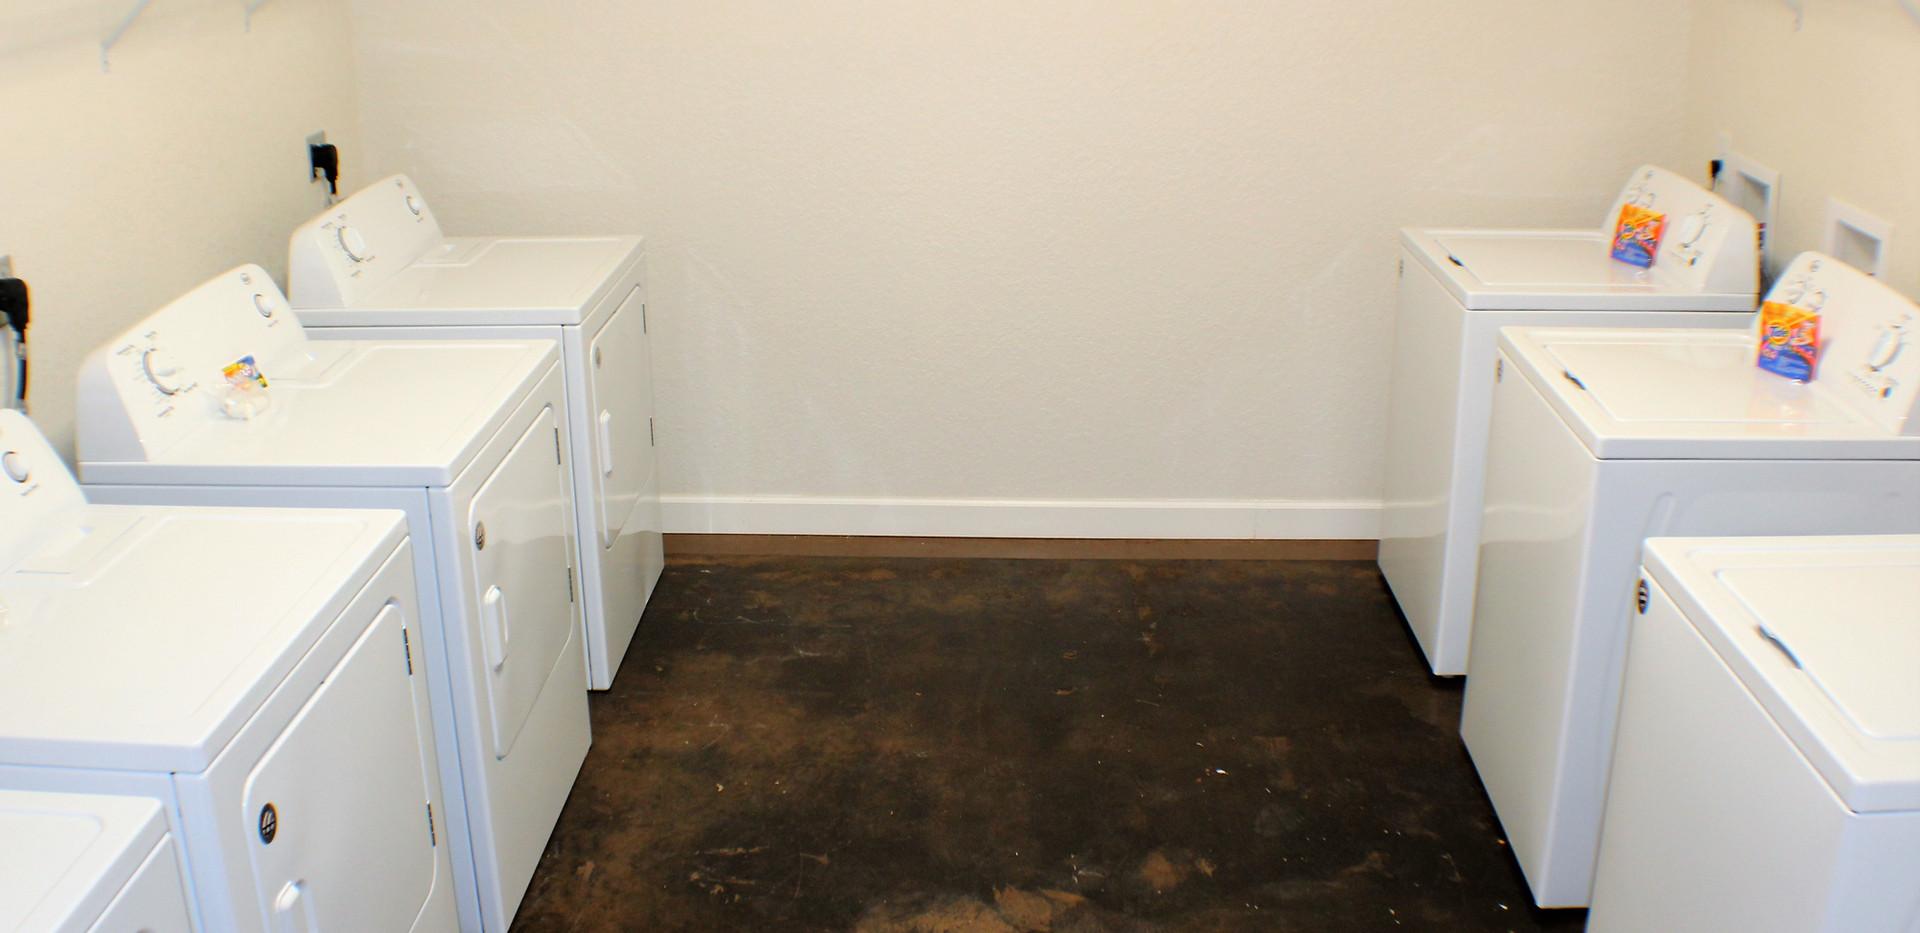 The_Woodlands_Laundry_Facility__1_.jpg